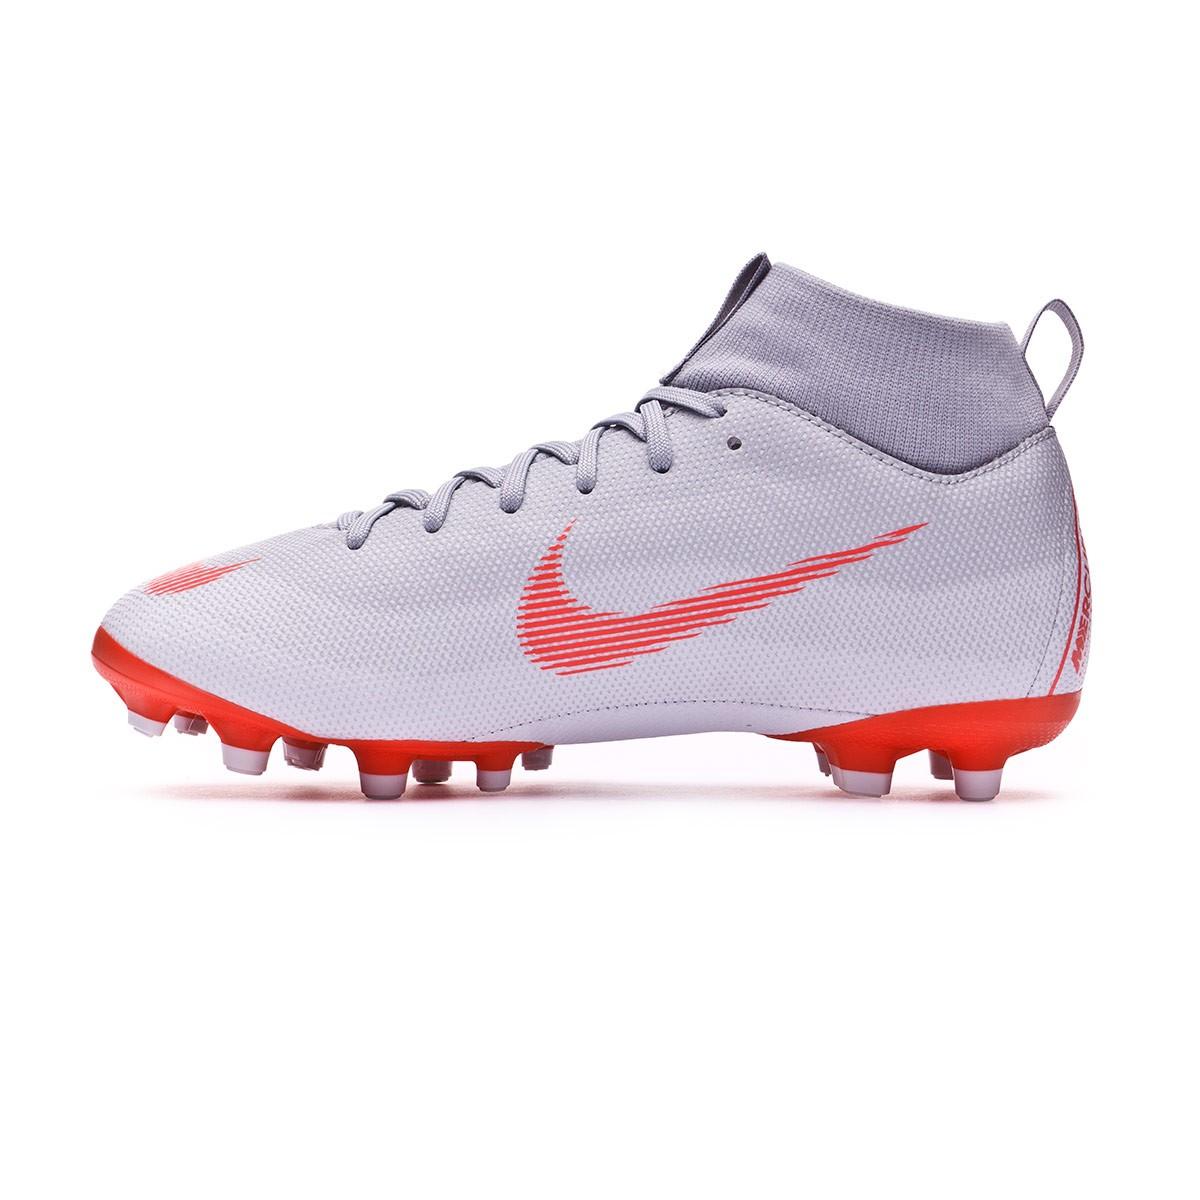 sale retailer 23b0b 71864 Football Boots Nike Kids Mercurial Superfly VI Academy GS MG Wolf grey-Light  crimson-Pure platinum - Tienda de fútbol Fútbol Emotion